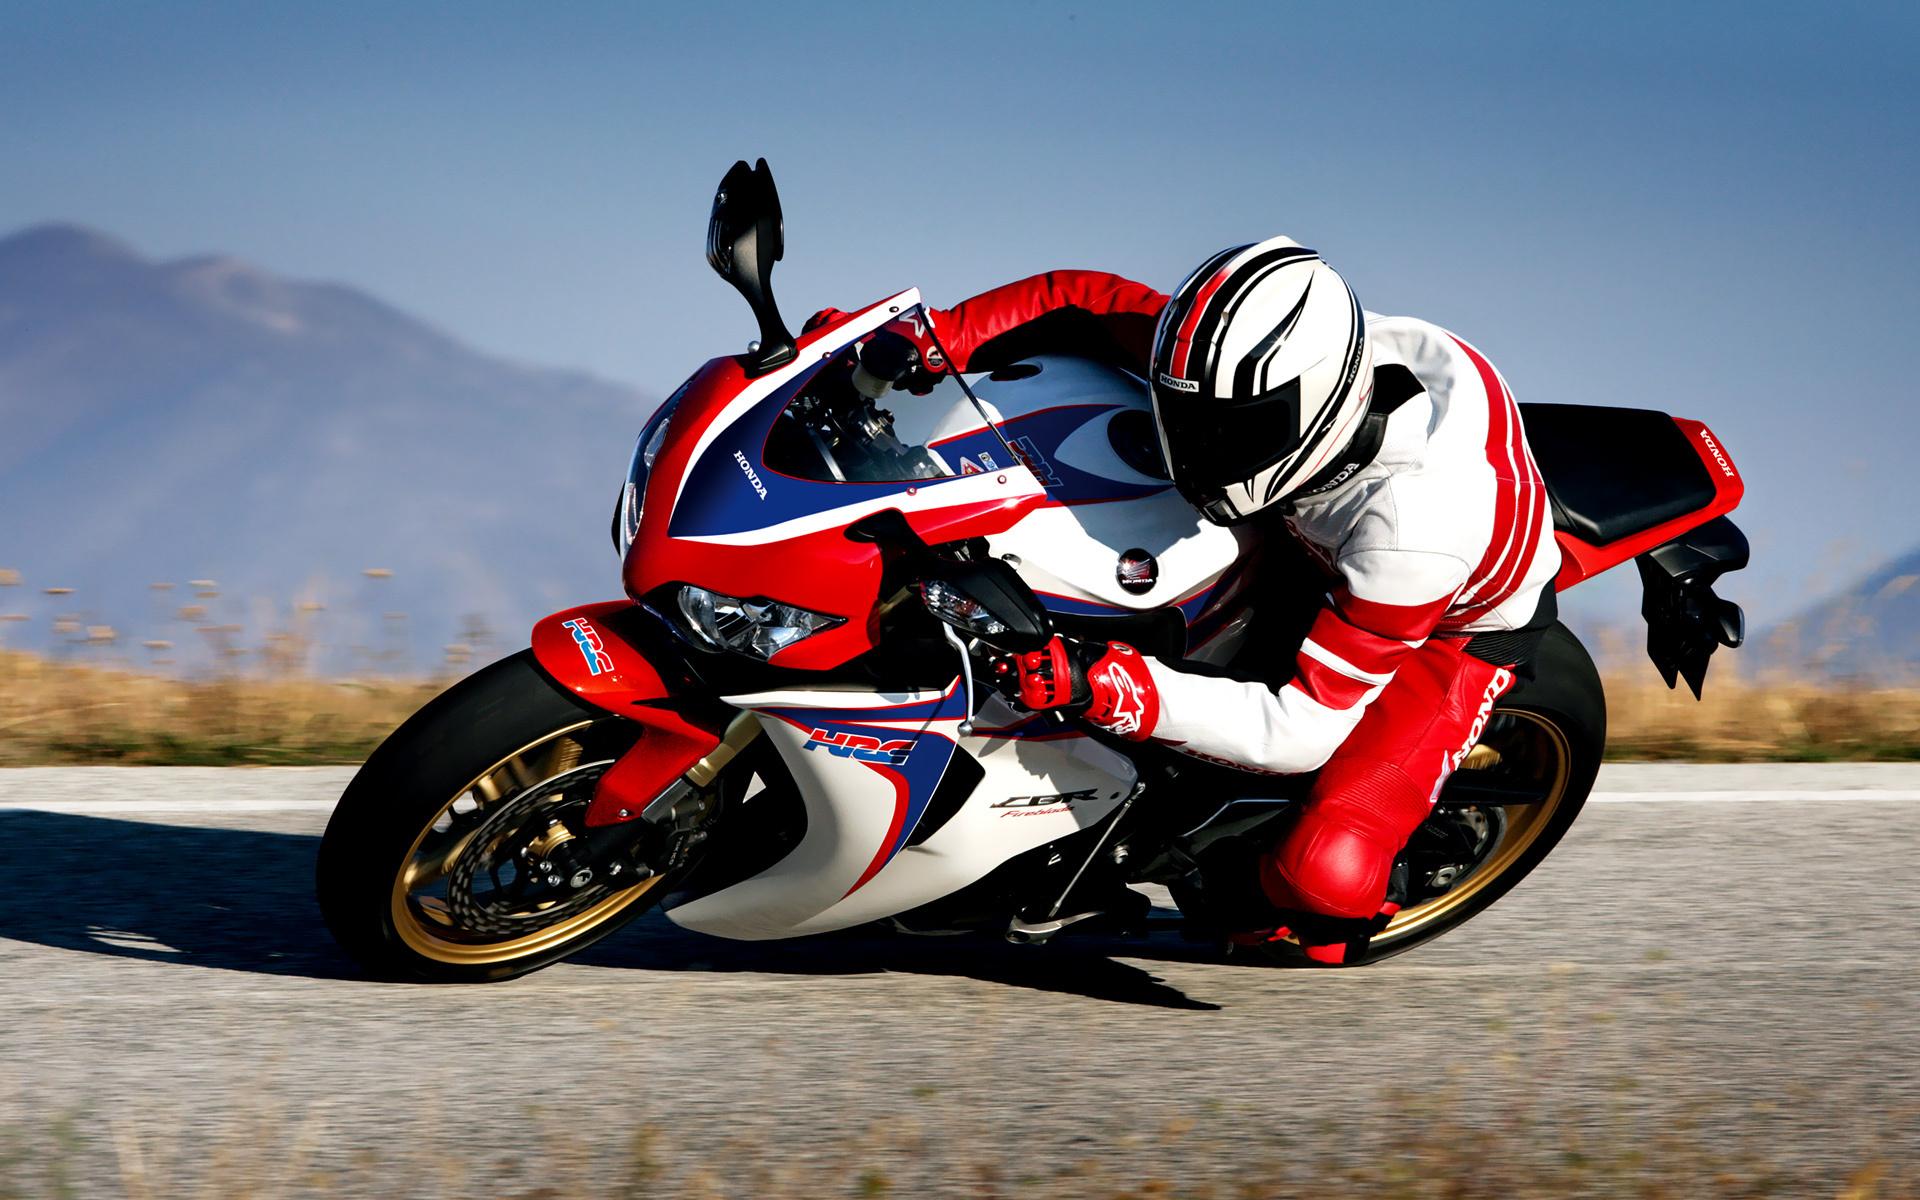 вираж мотоциклист без смс